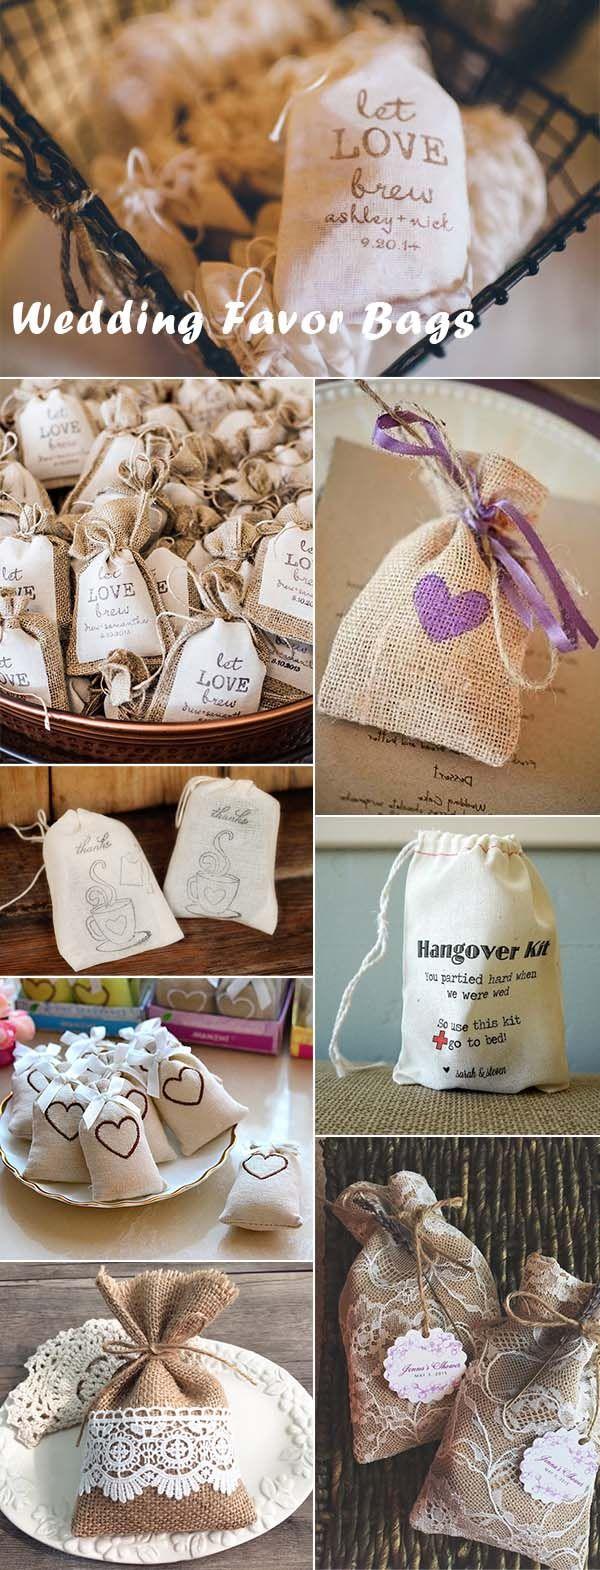 rustic wedding favor bags ideas